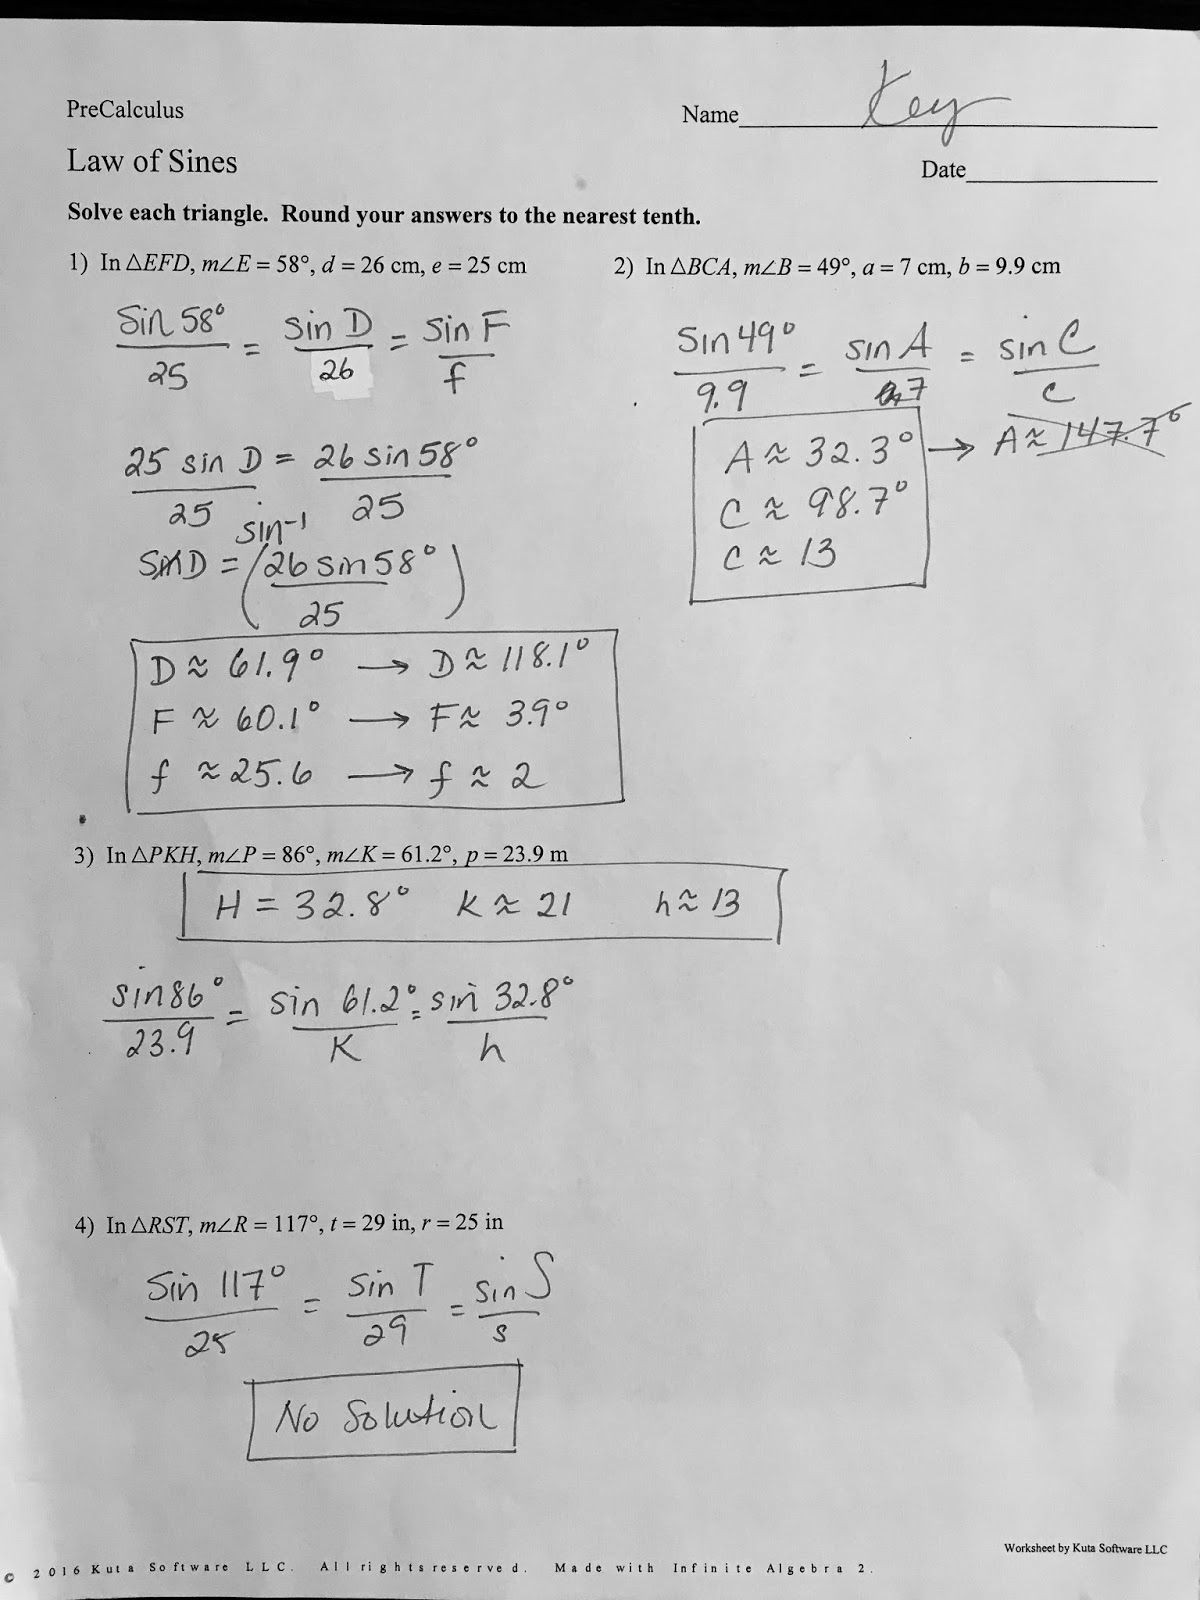 Solve Trig Equations Worksheet Precalculus 441 solving Trigonometric Equations Worksheets